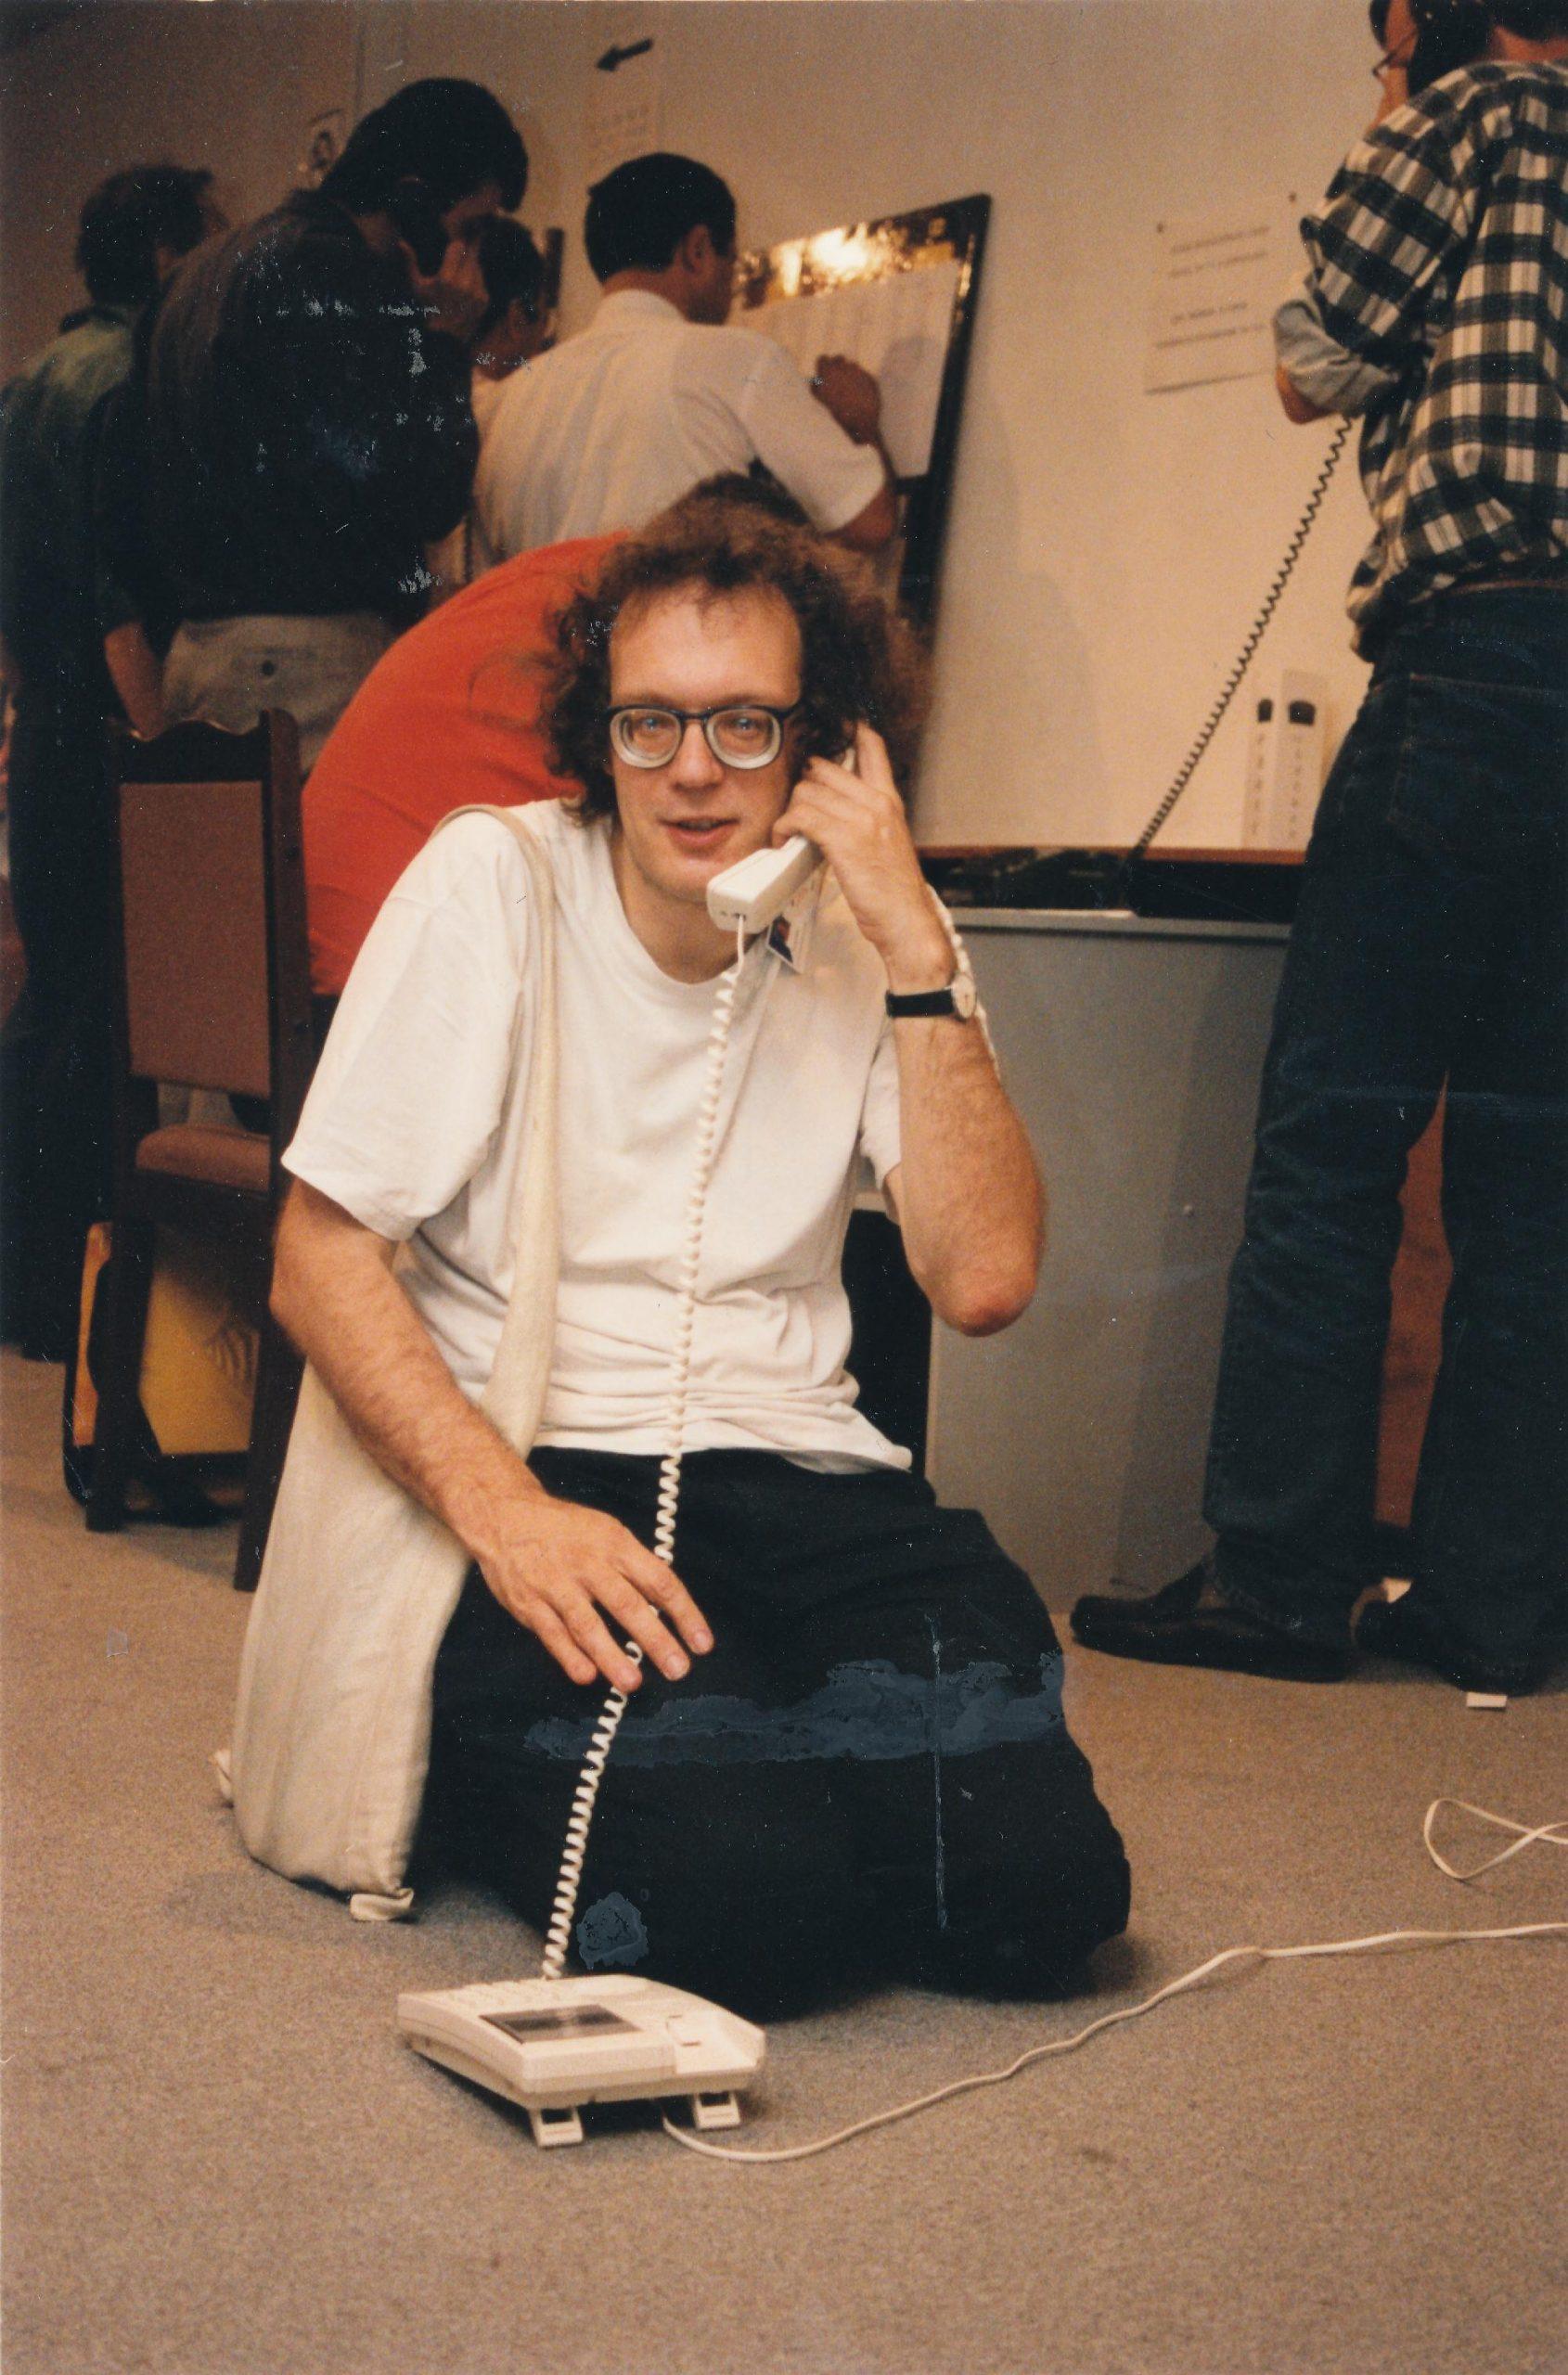 Jonathan Speelman telephones good news